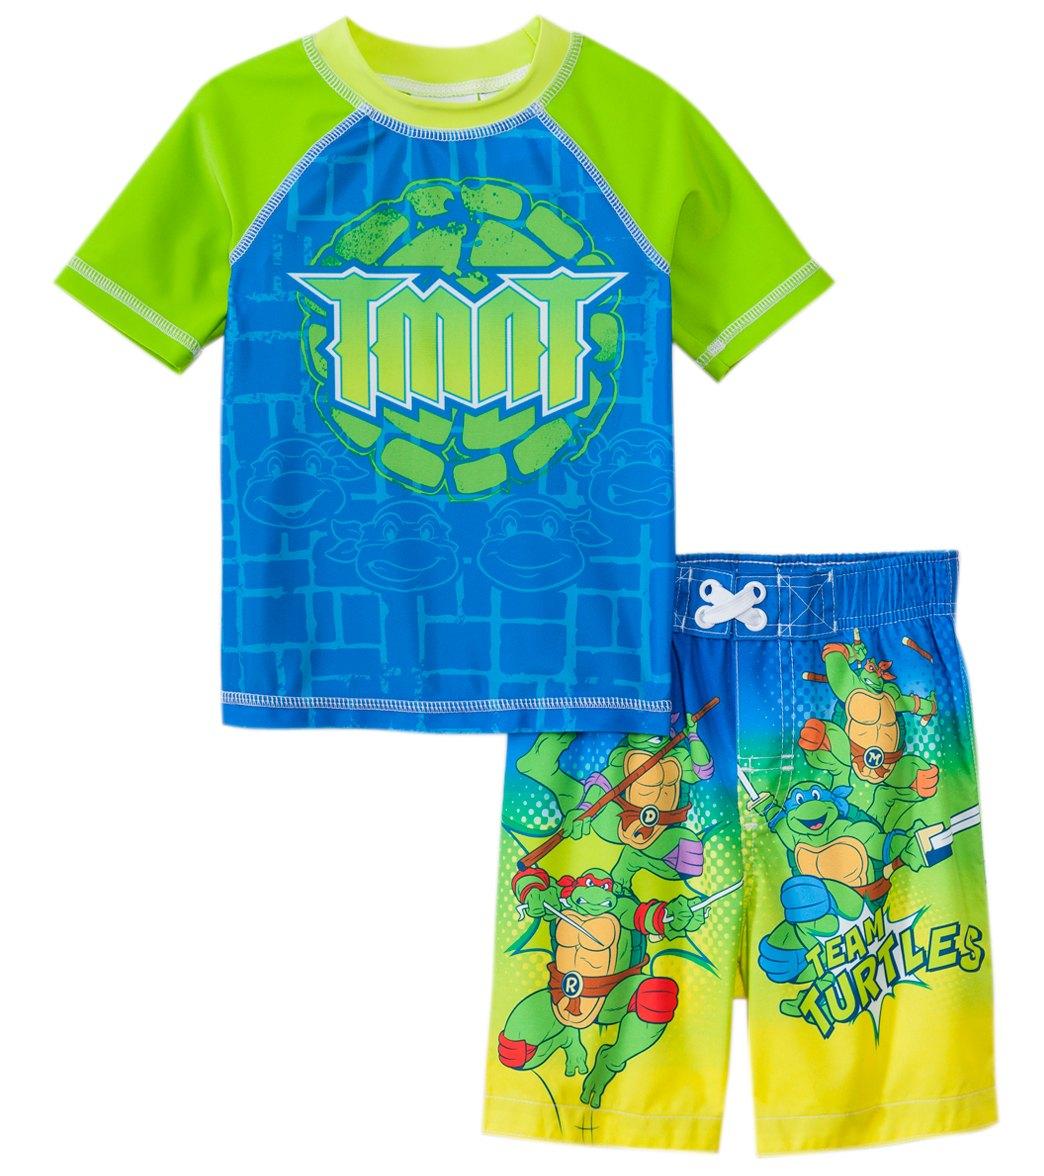 5f7dc83700 Nickelodeon Boys' Teenage Mutant Ninja Turtles Swim Trunks & Rashguard Set  (2T-4T) at SwimOutlet.com